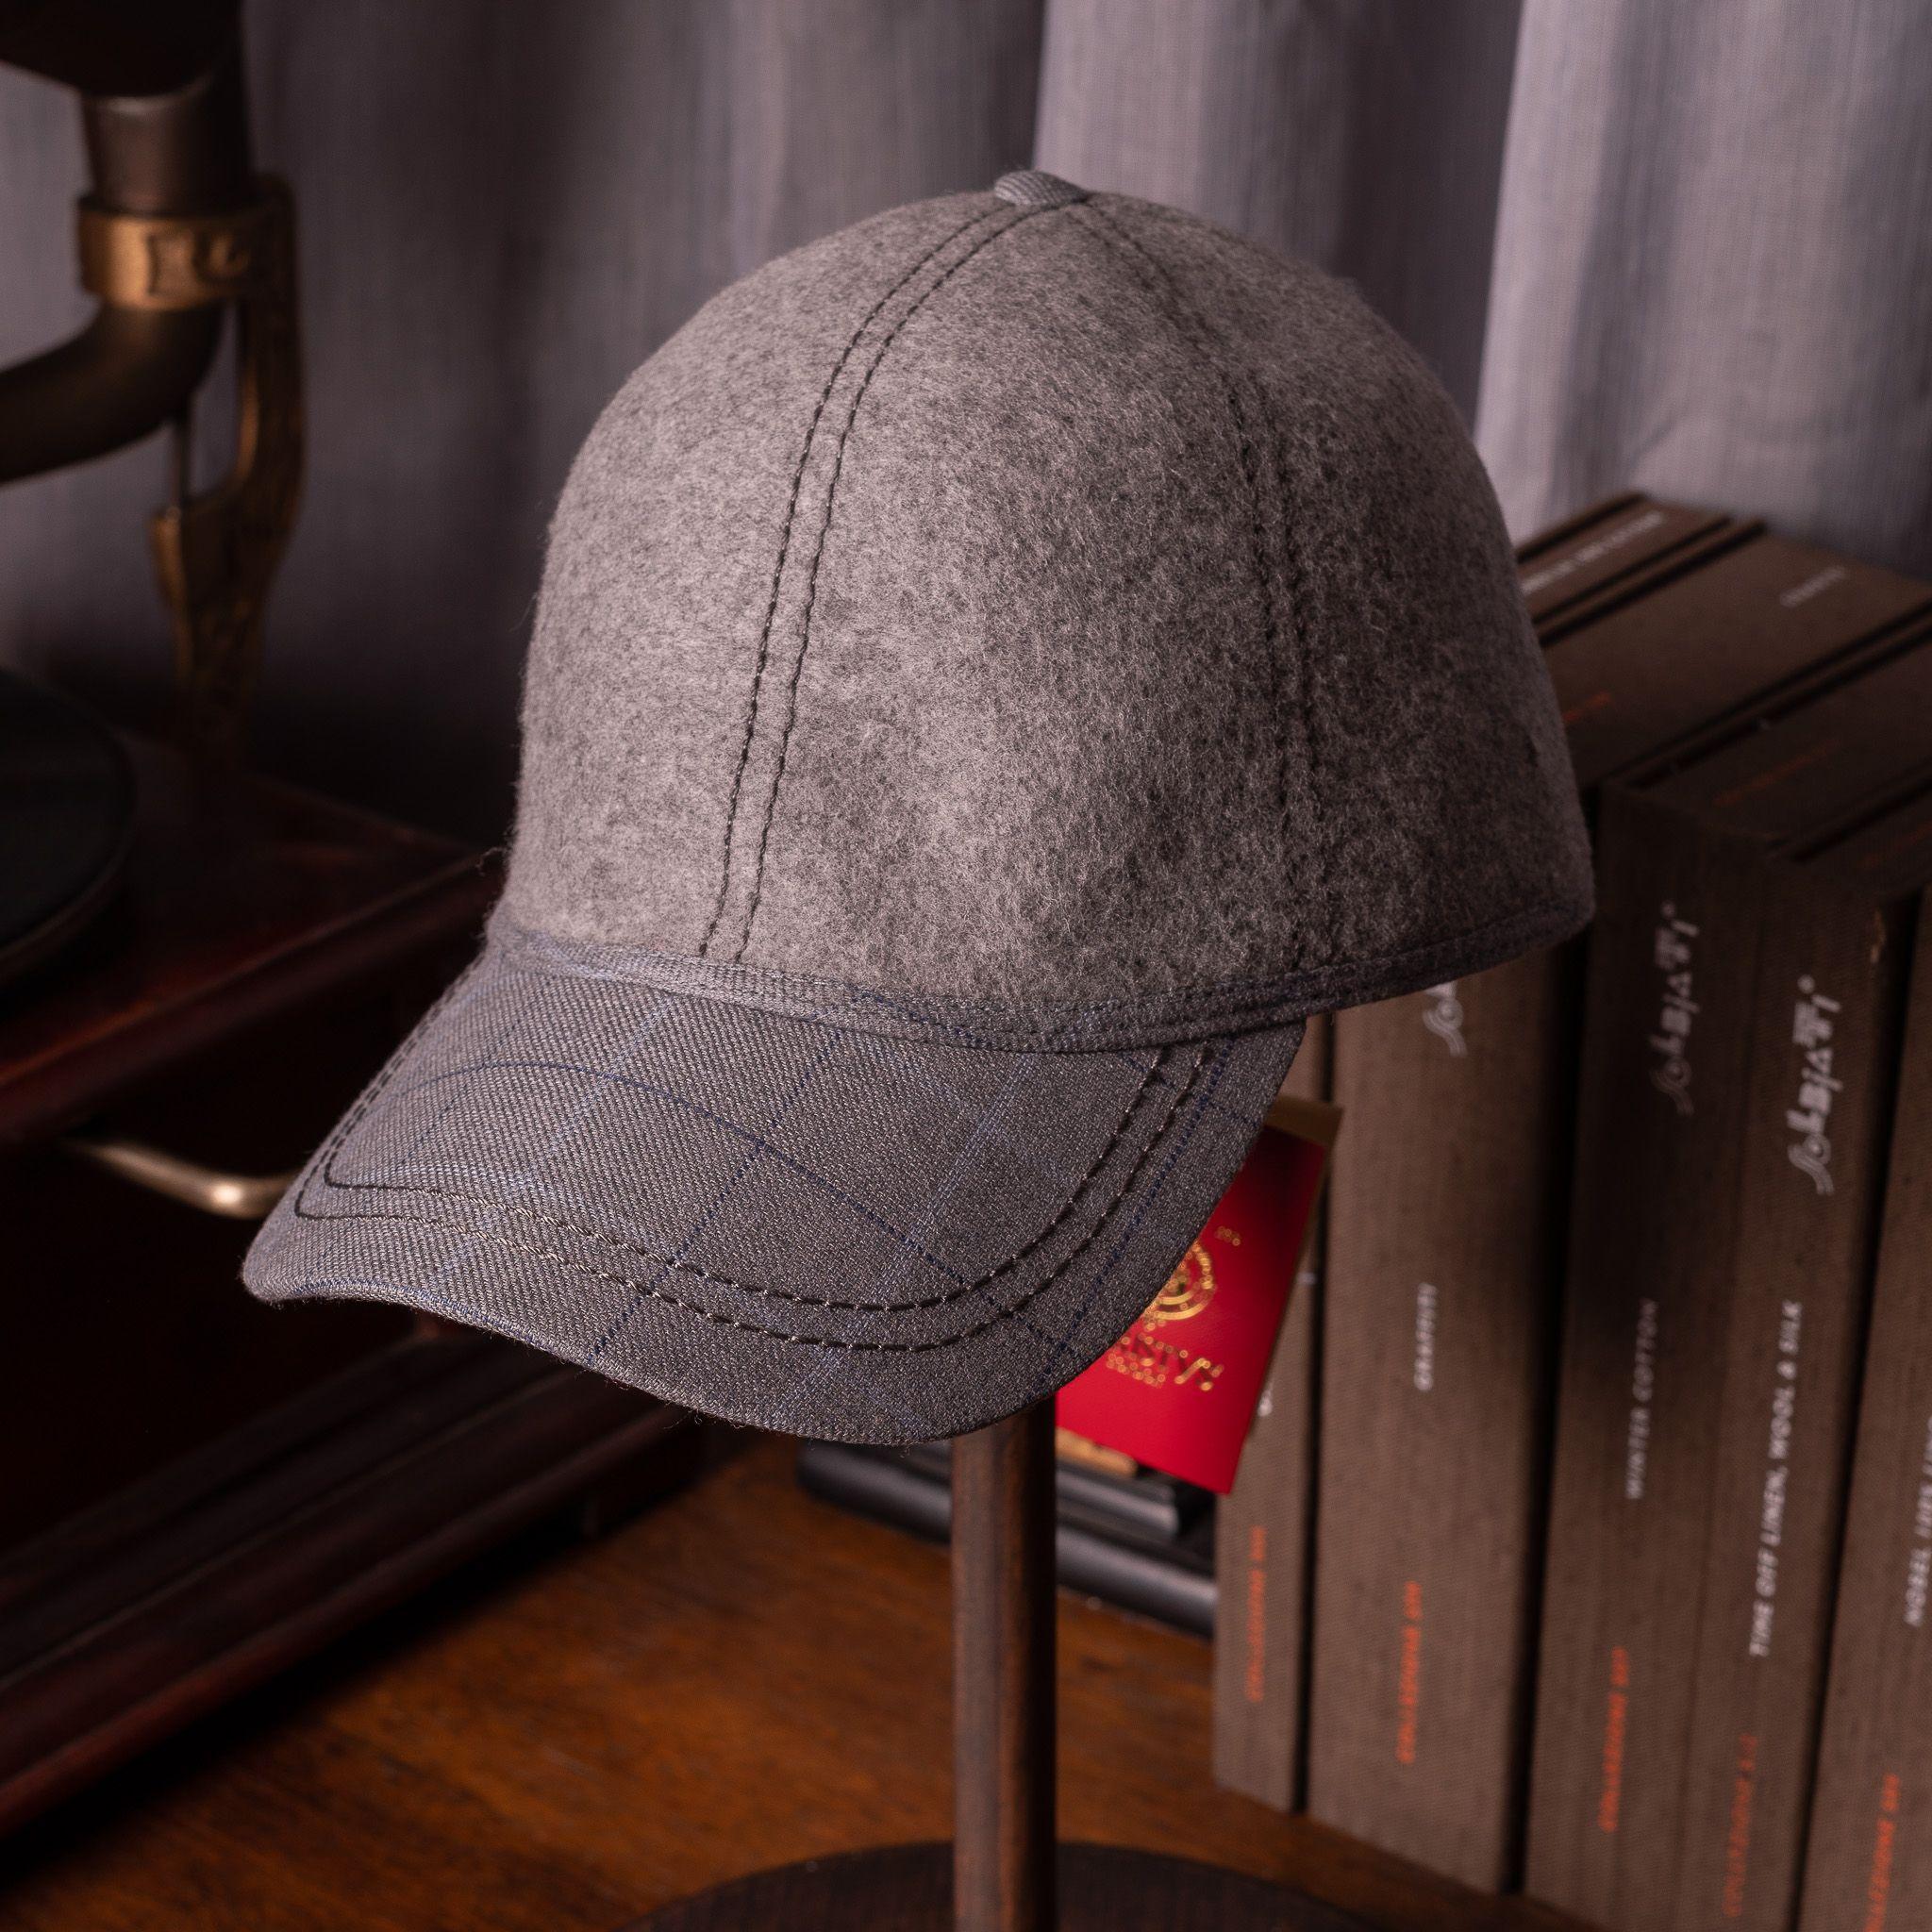 Christy's Baseball cap Grey mix with Grey Raker Check